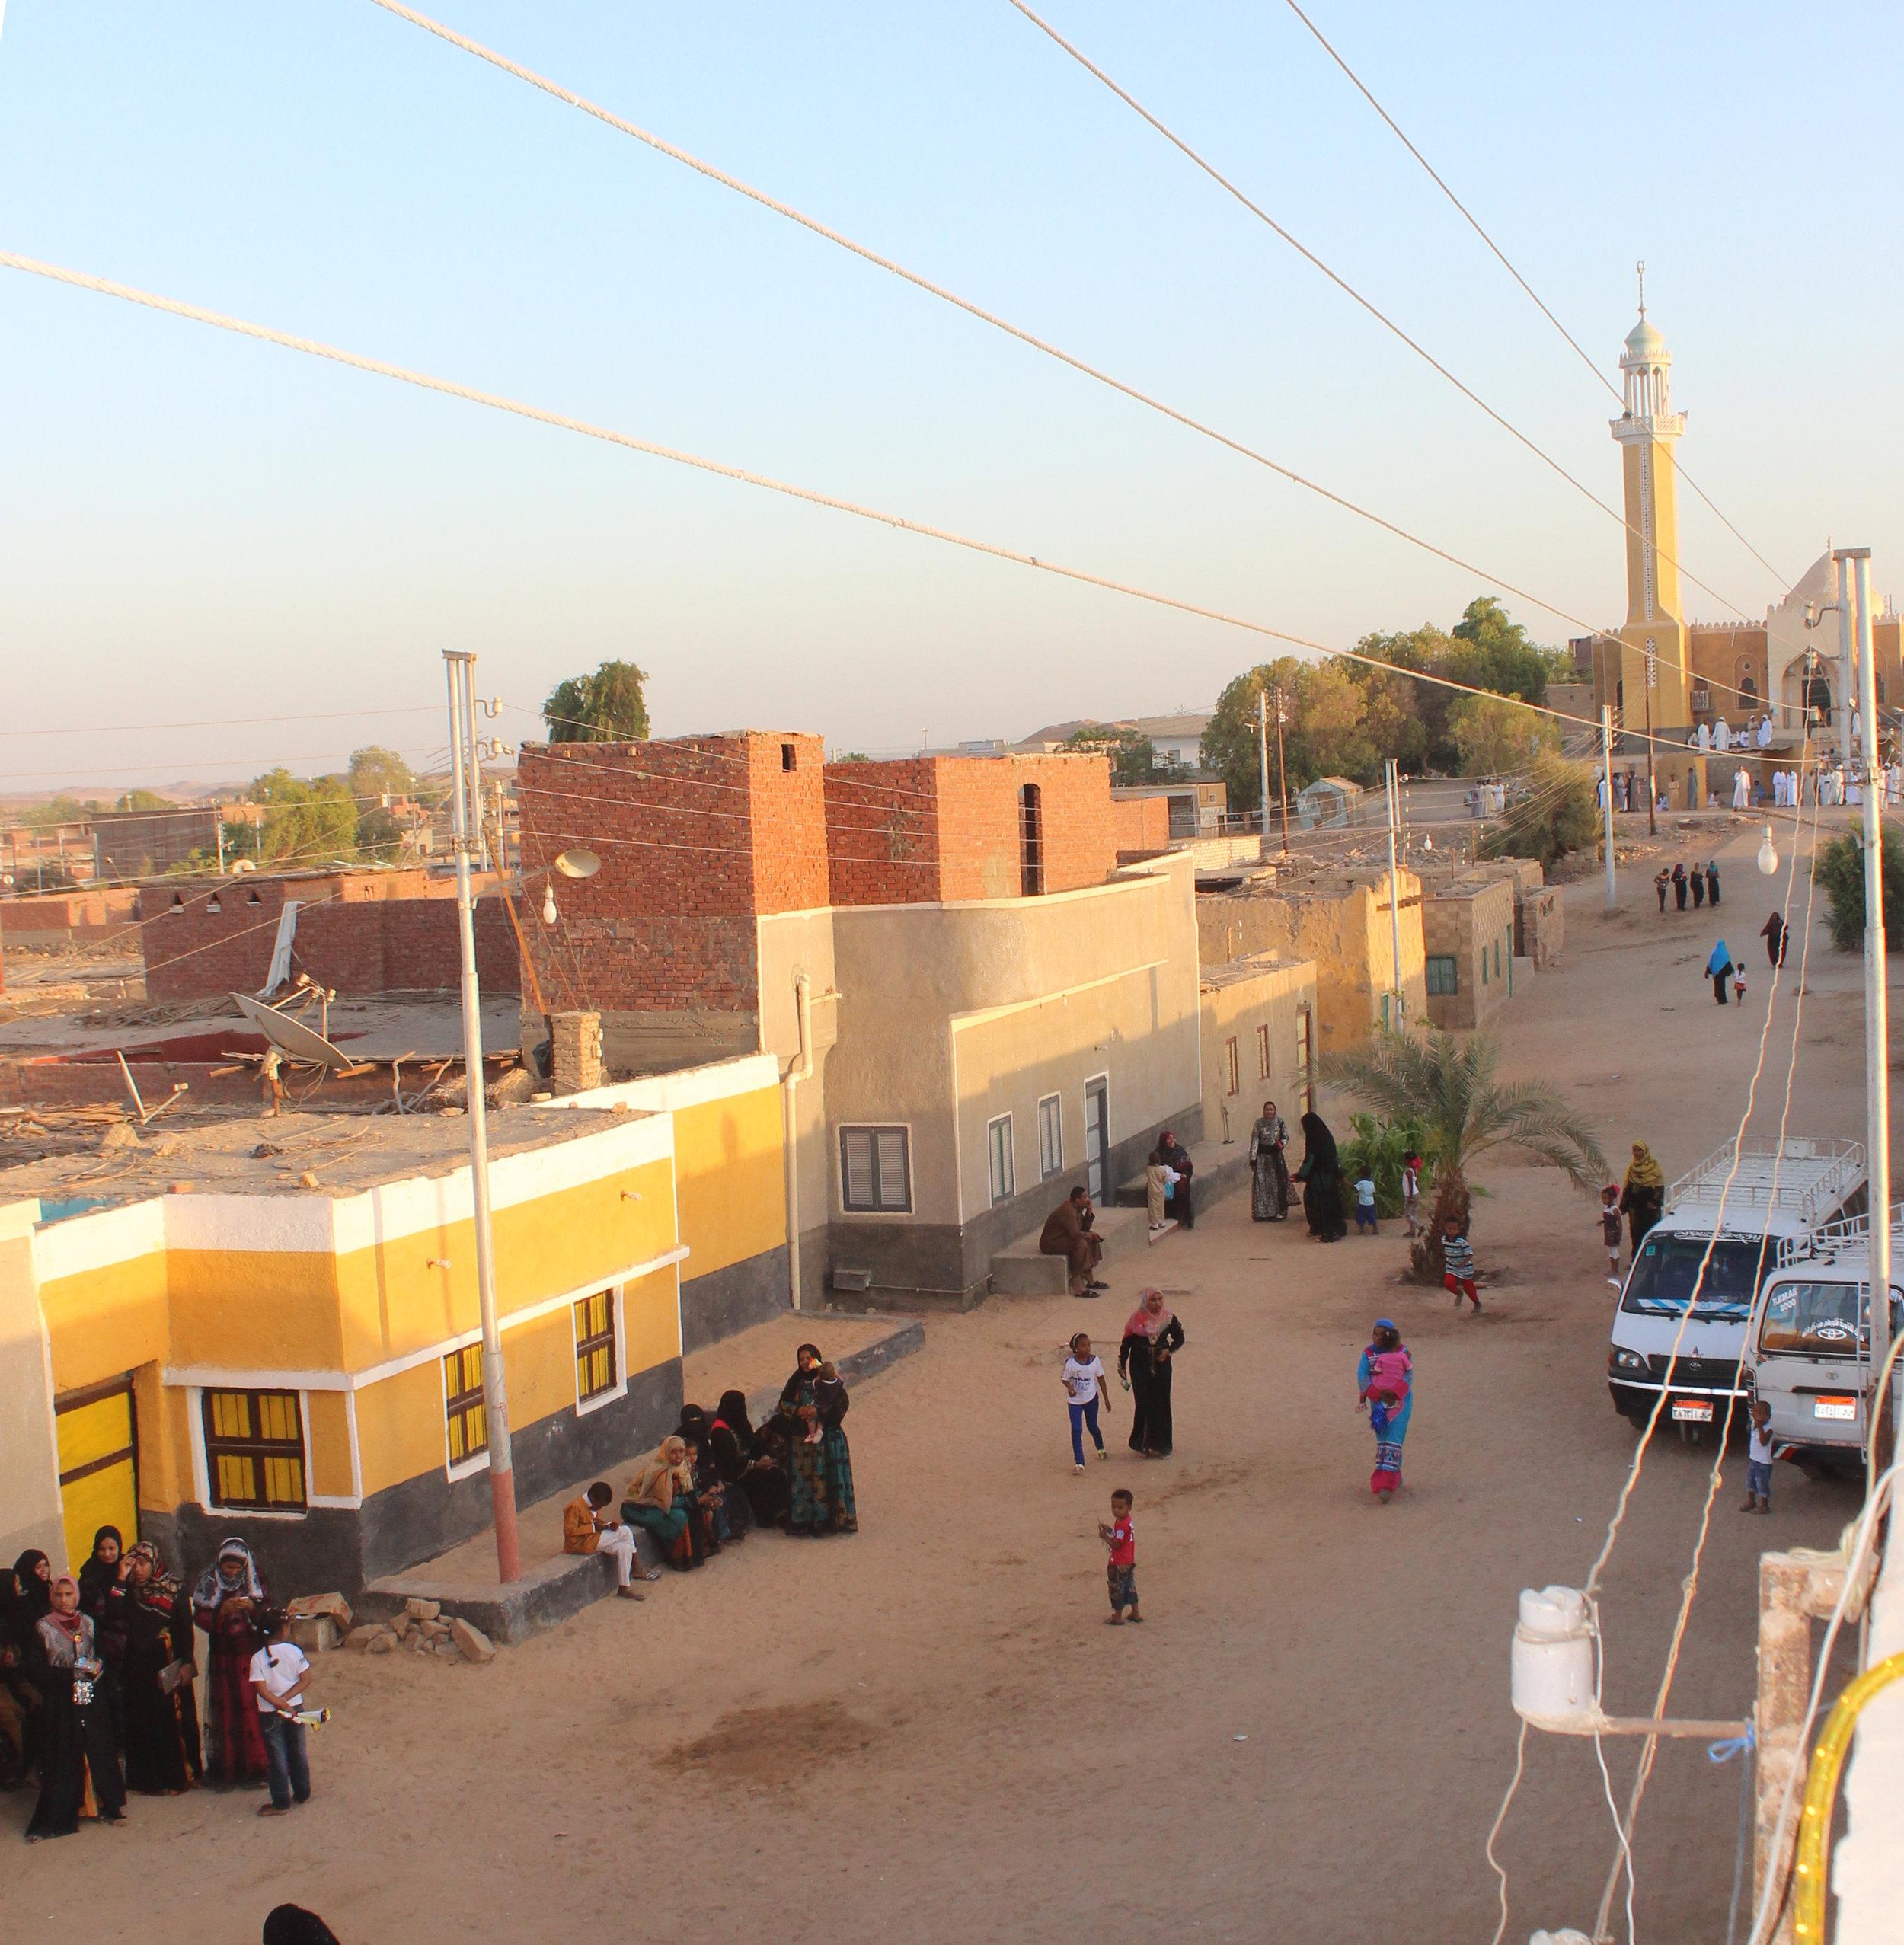 igure 1: Nubian women in Qustul settlement occupying the public space, photo:  Menatalla Ahmed Agha